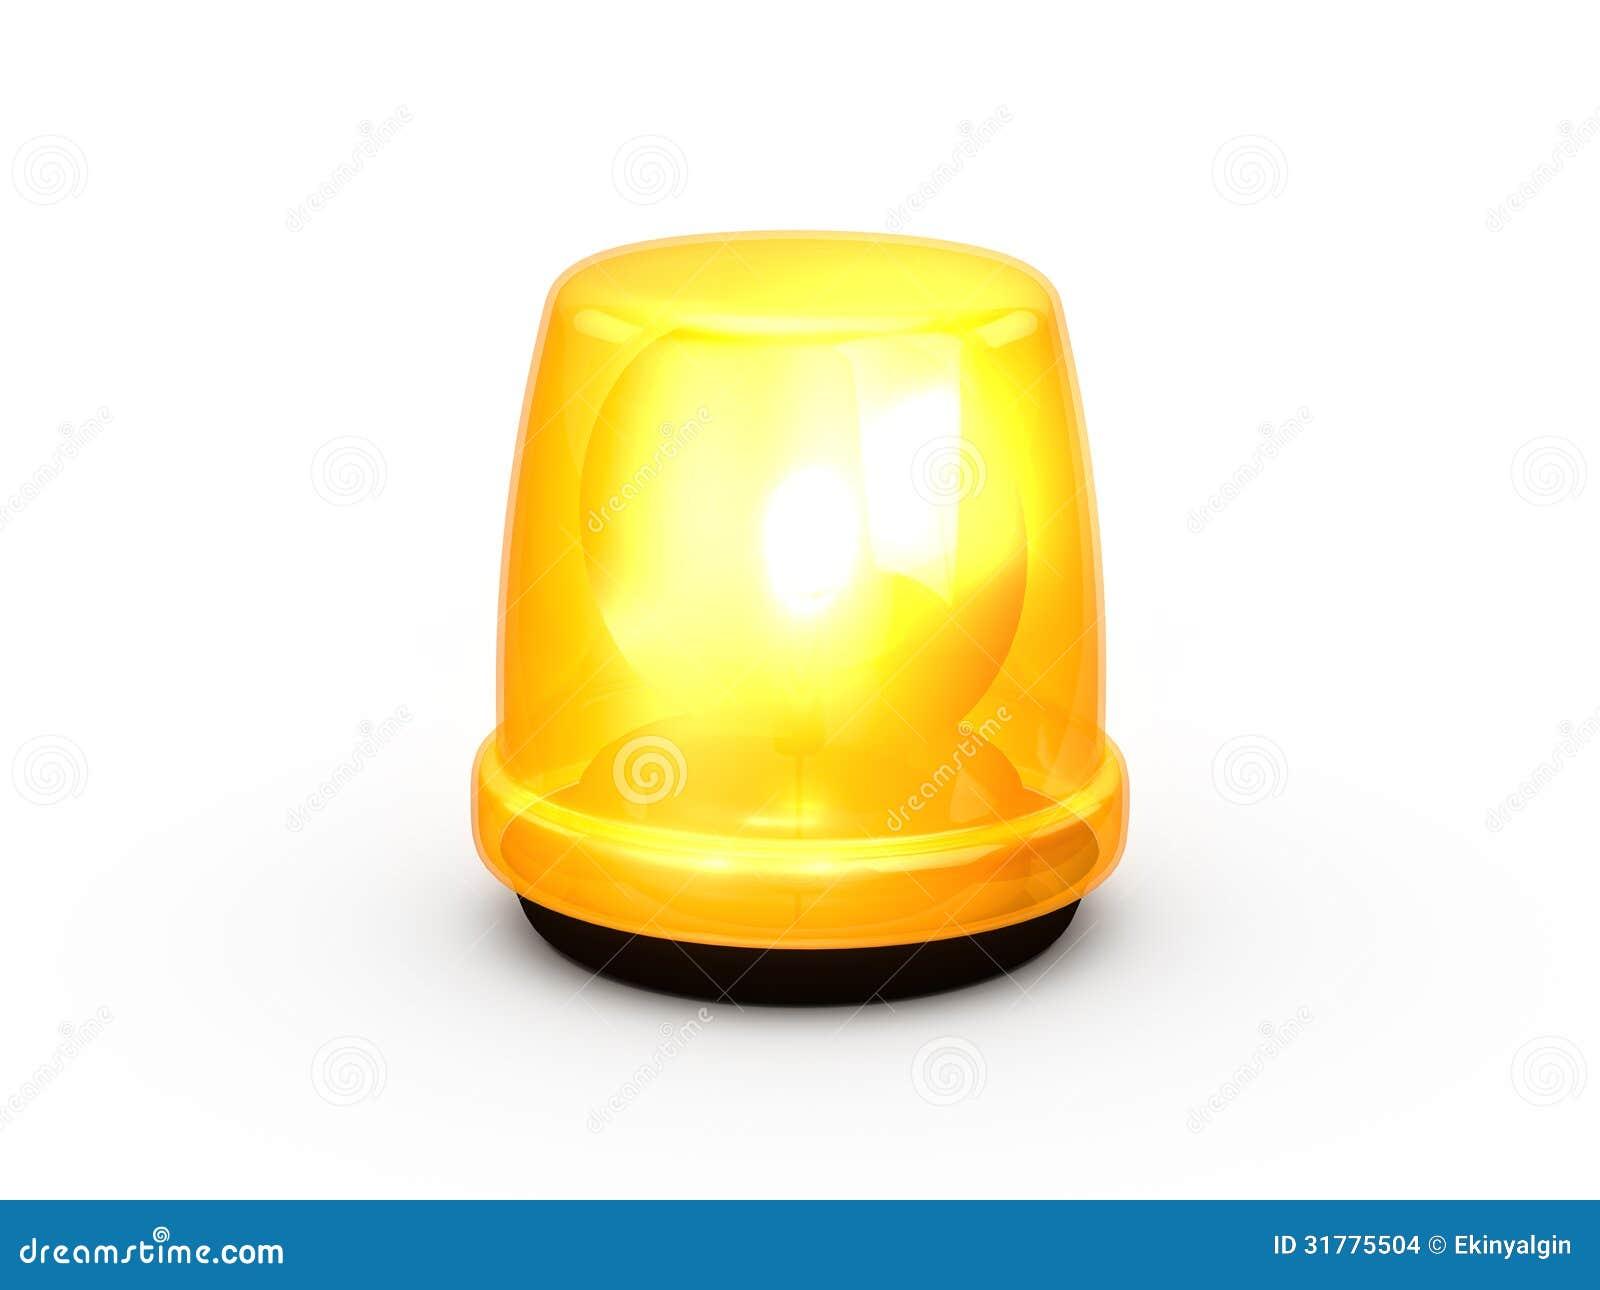 horn led alert item warning alarm siren signal security lamp strobe light indicator flashing